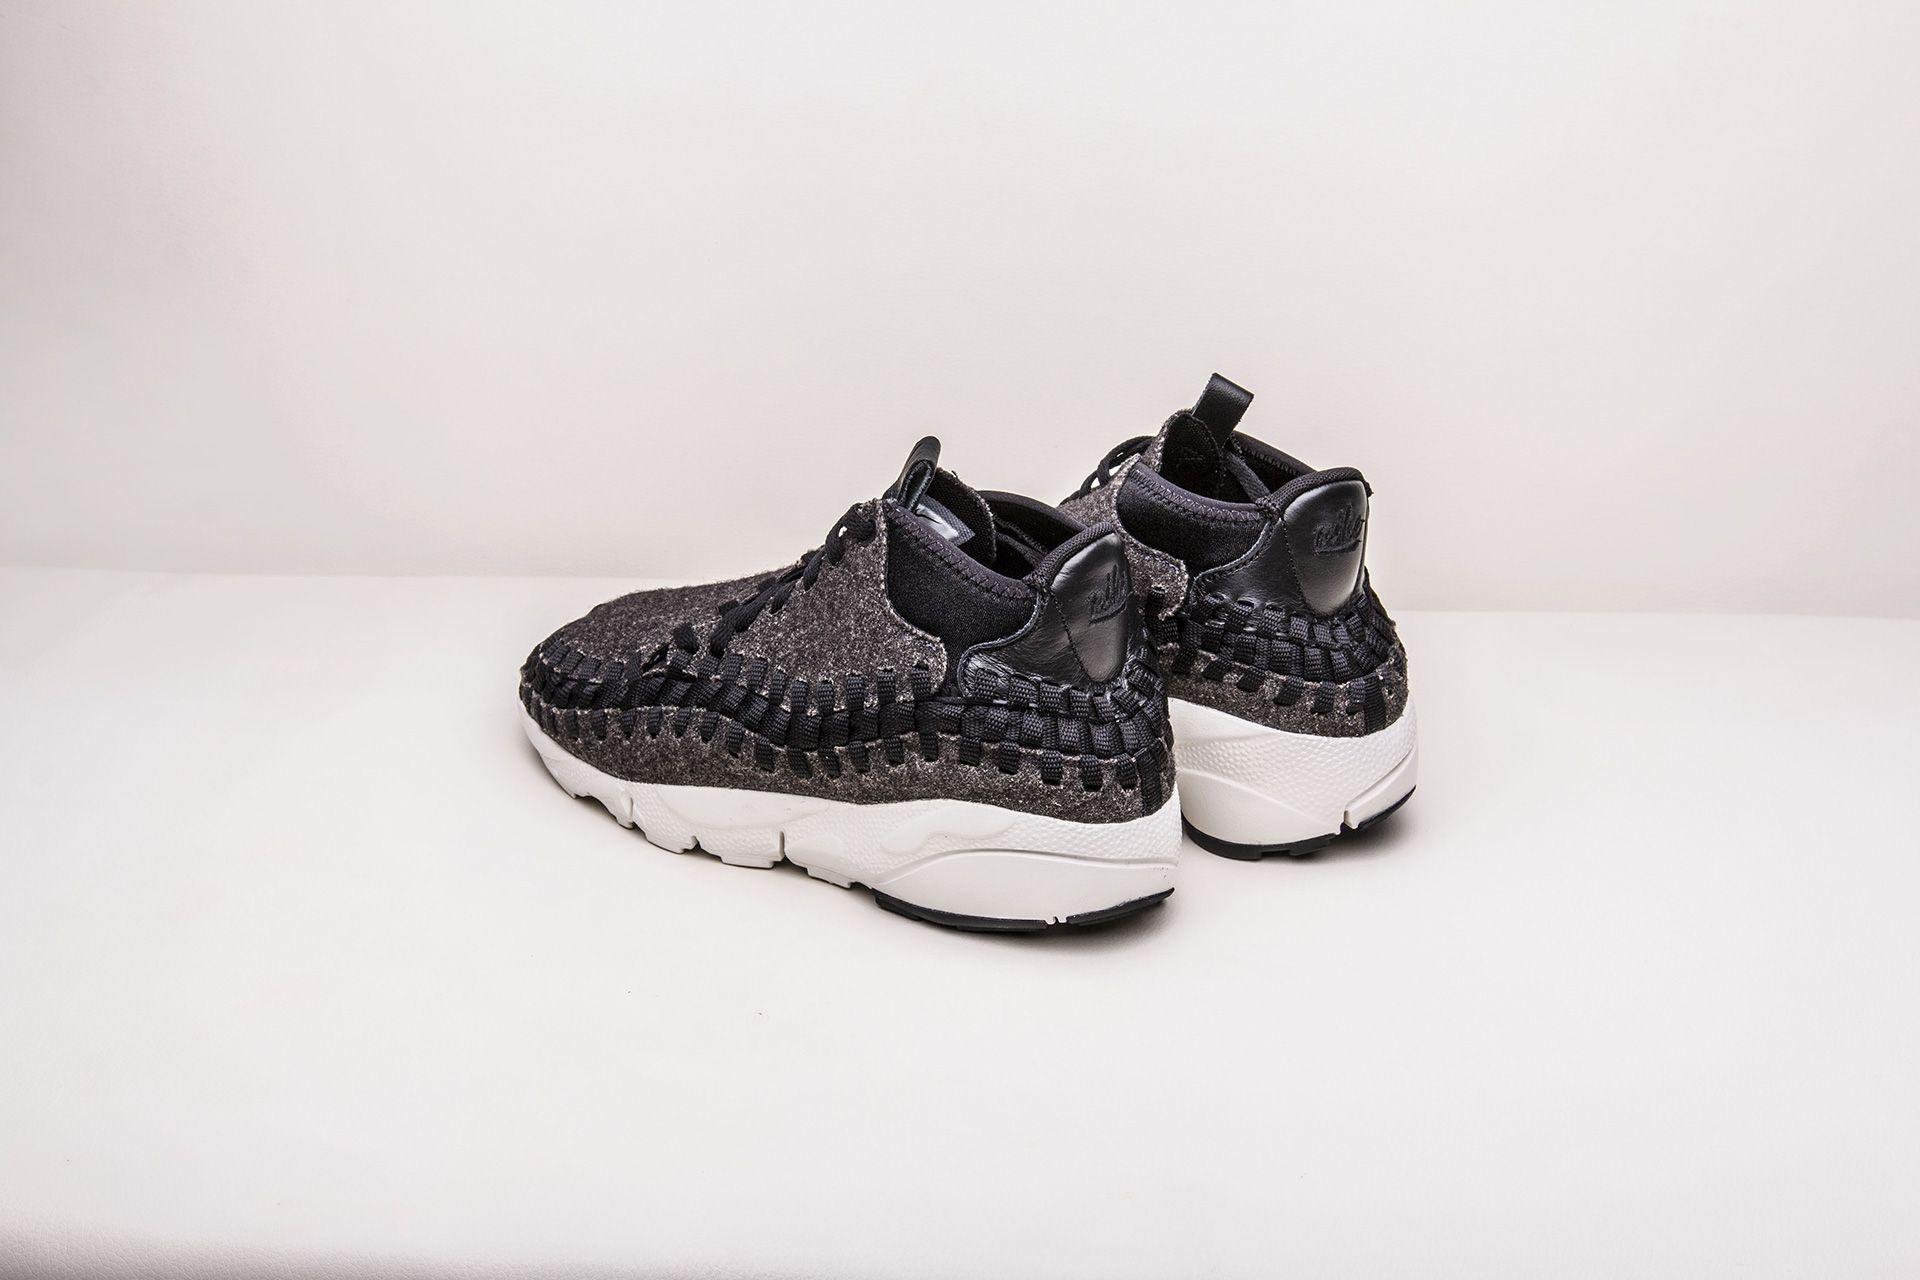 buy online 73e39 250cd ... 7 картинки · Купить мужские черные кроссовки Nike Air Footscape Woven  Chukka SE - фото 8 картинки